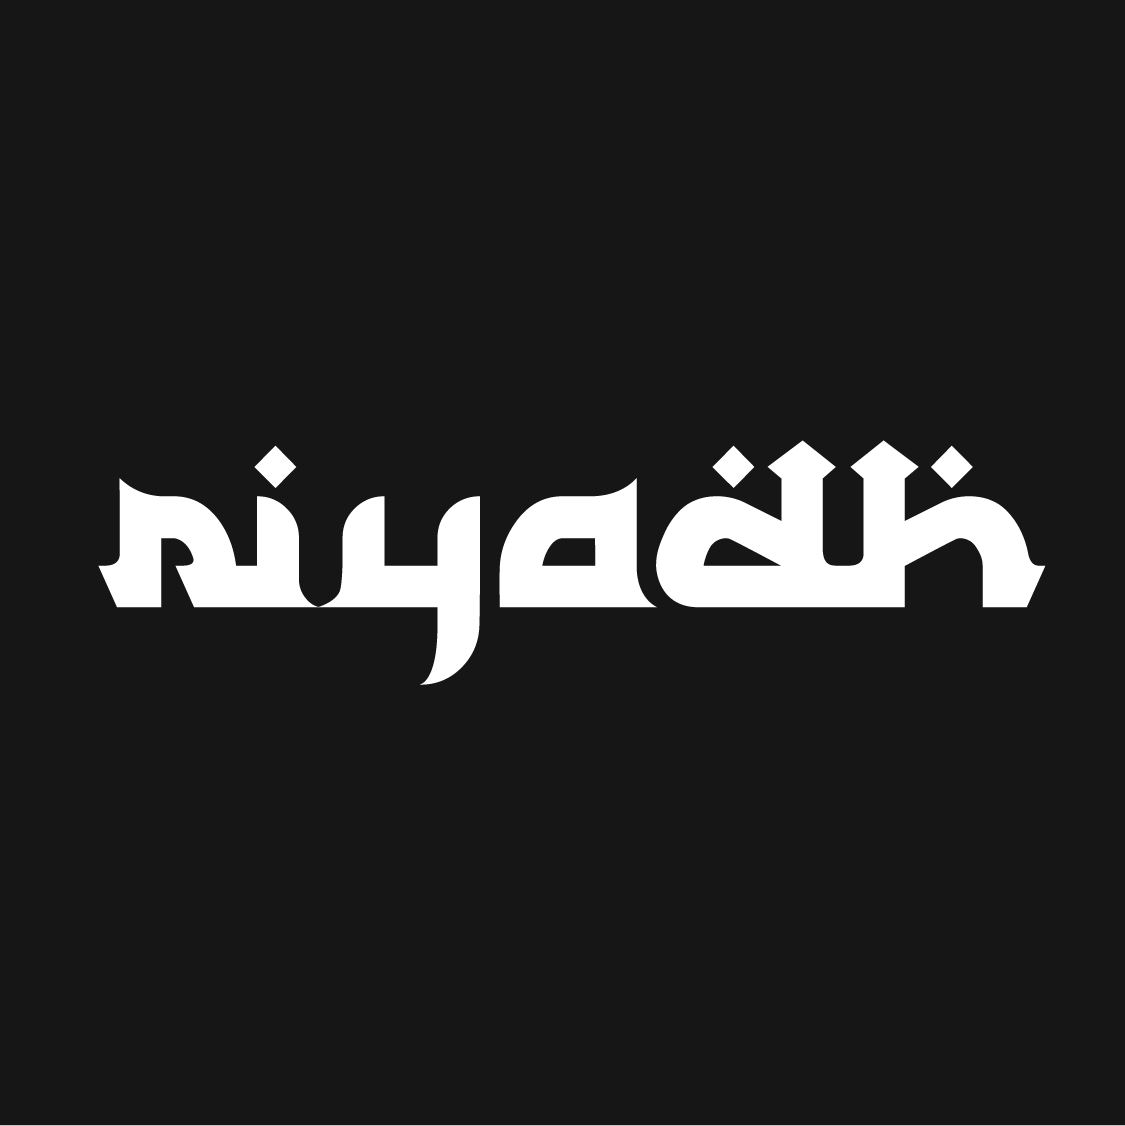 all-logos-2020-66